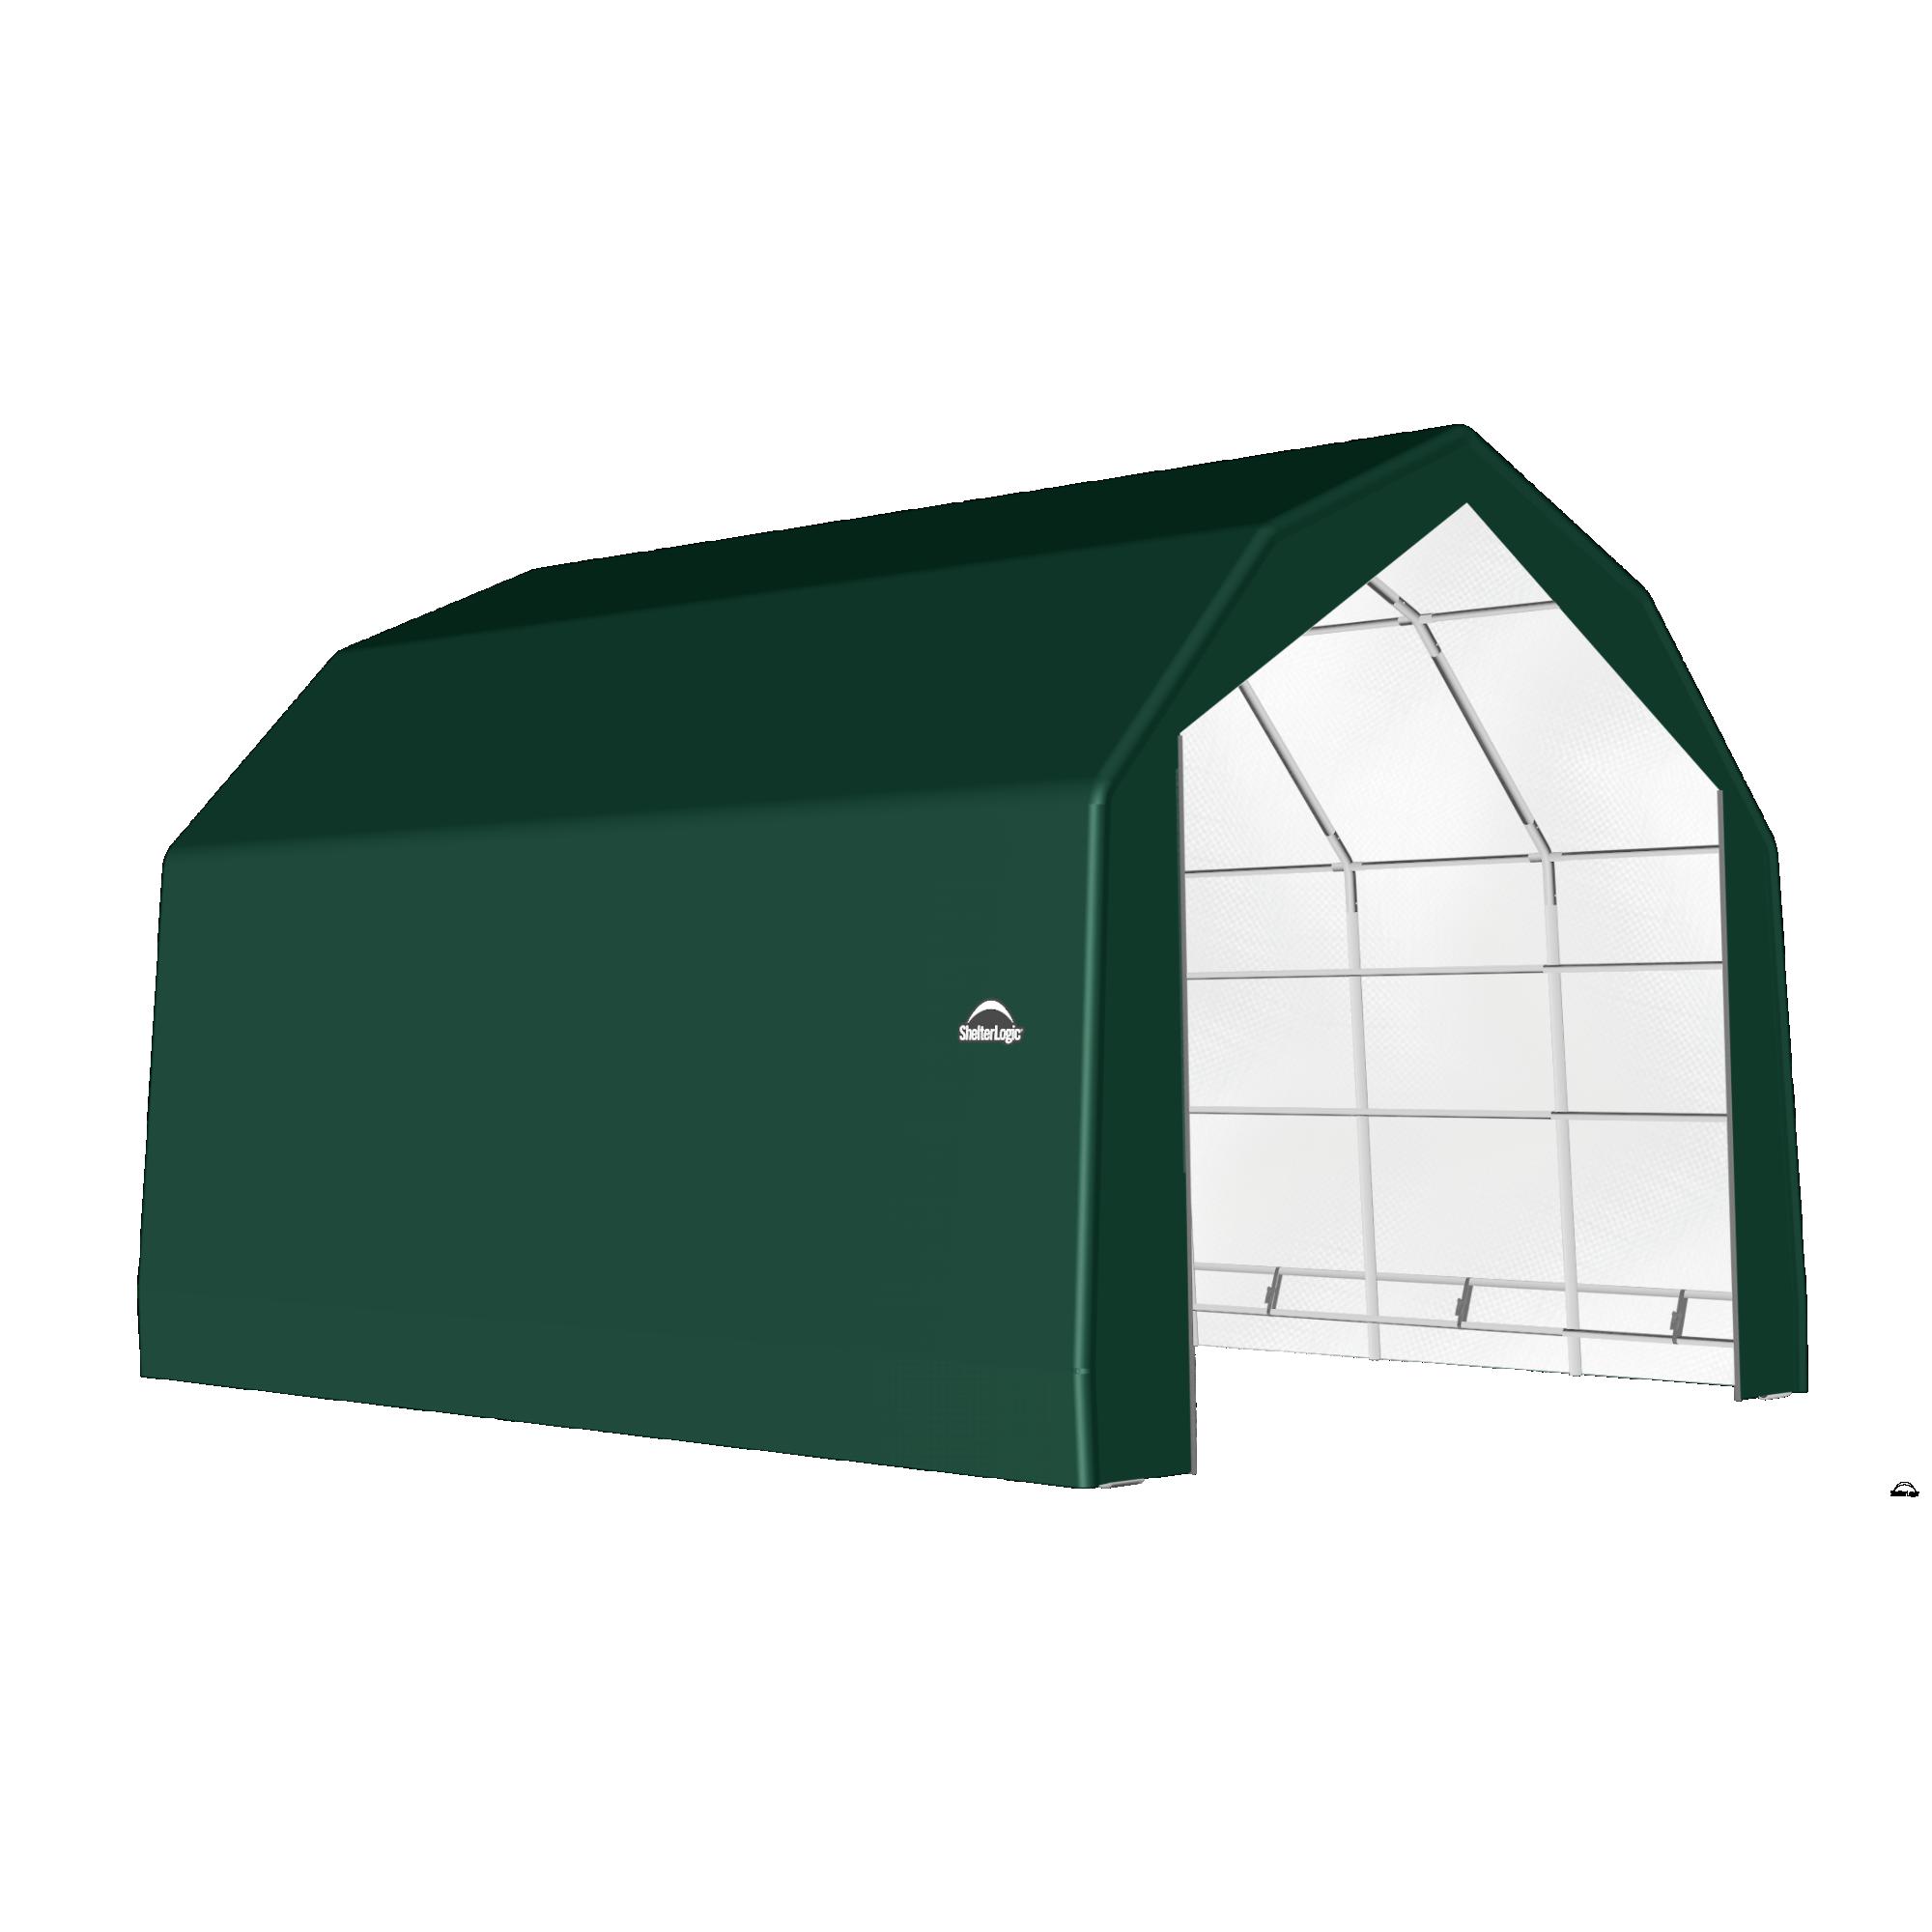 SP Barn 20X28X15 Green 14 oz PE Shelter